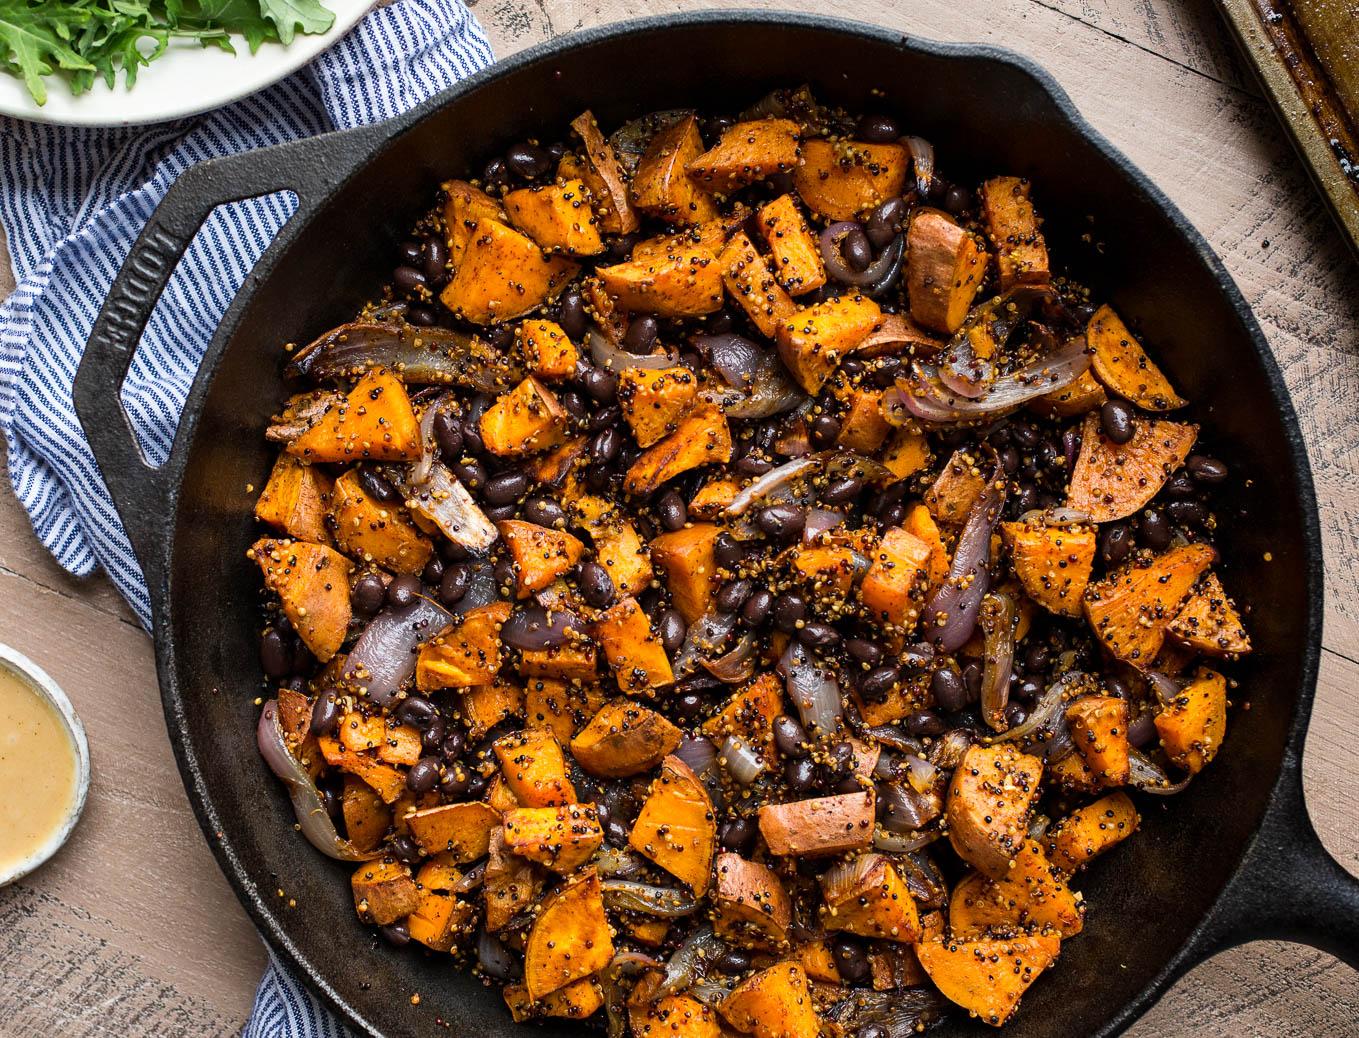 Roasted Sweet Potato, Black Bean, and Fried Quinoa Skillet | saltedplains.com